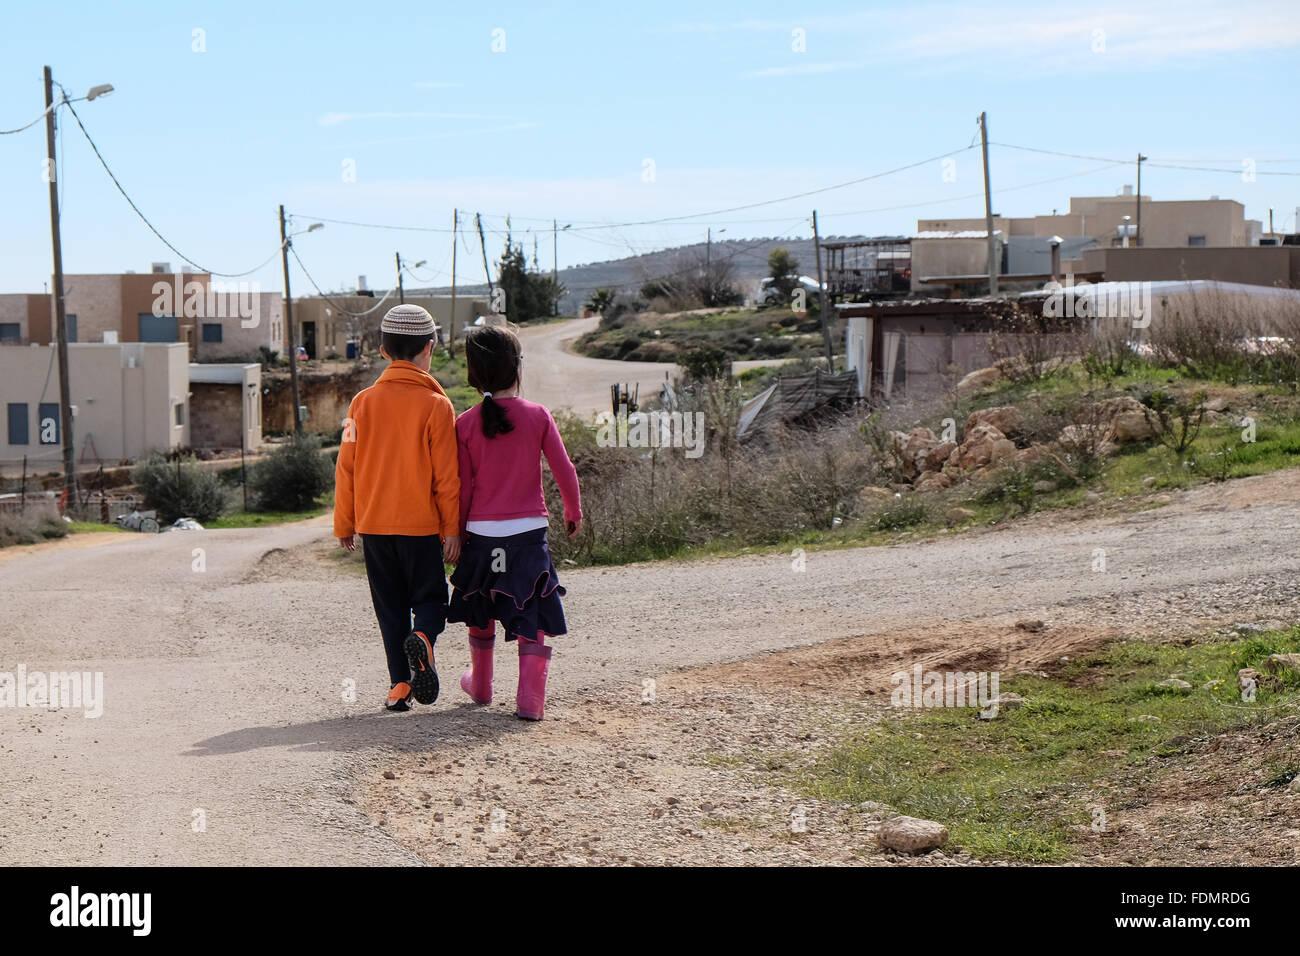 Kida, Israel. 1st February, 2016. Children walk the paths of the unauthorized settlement of Kida near Shiloh, housing - Stock Image